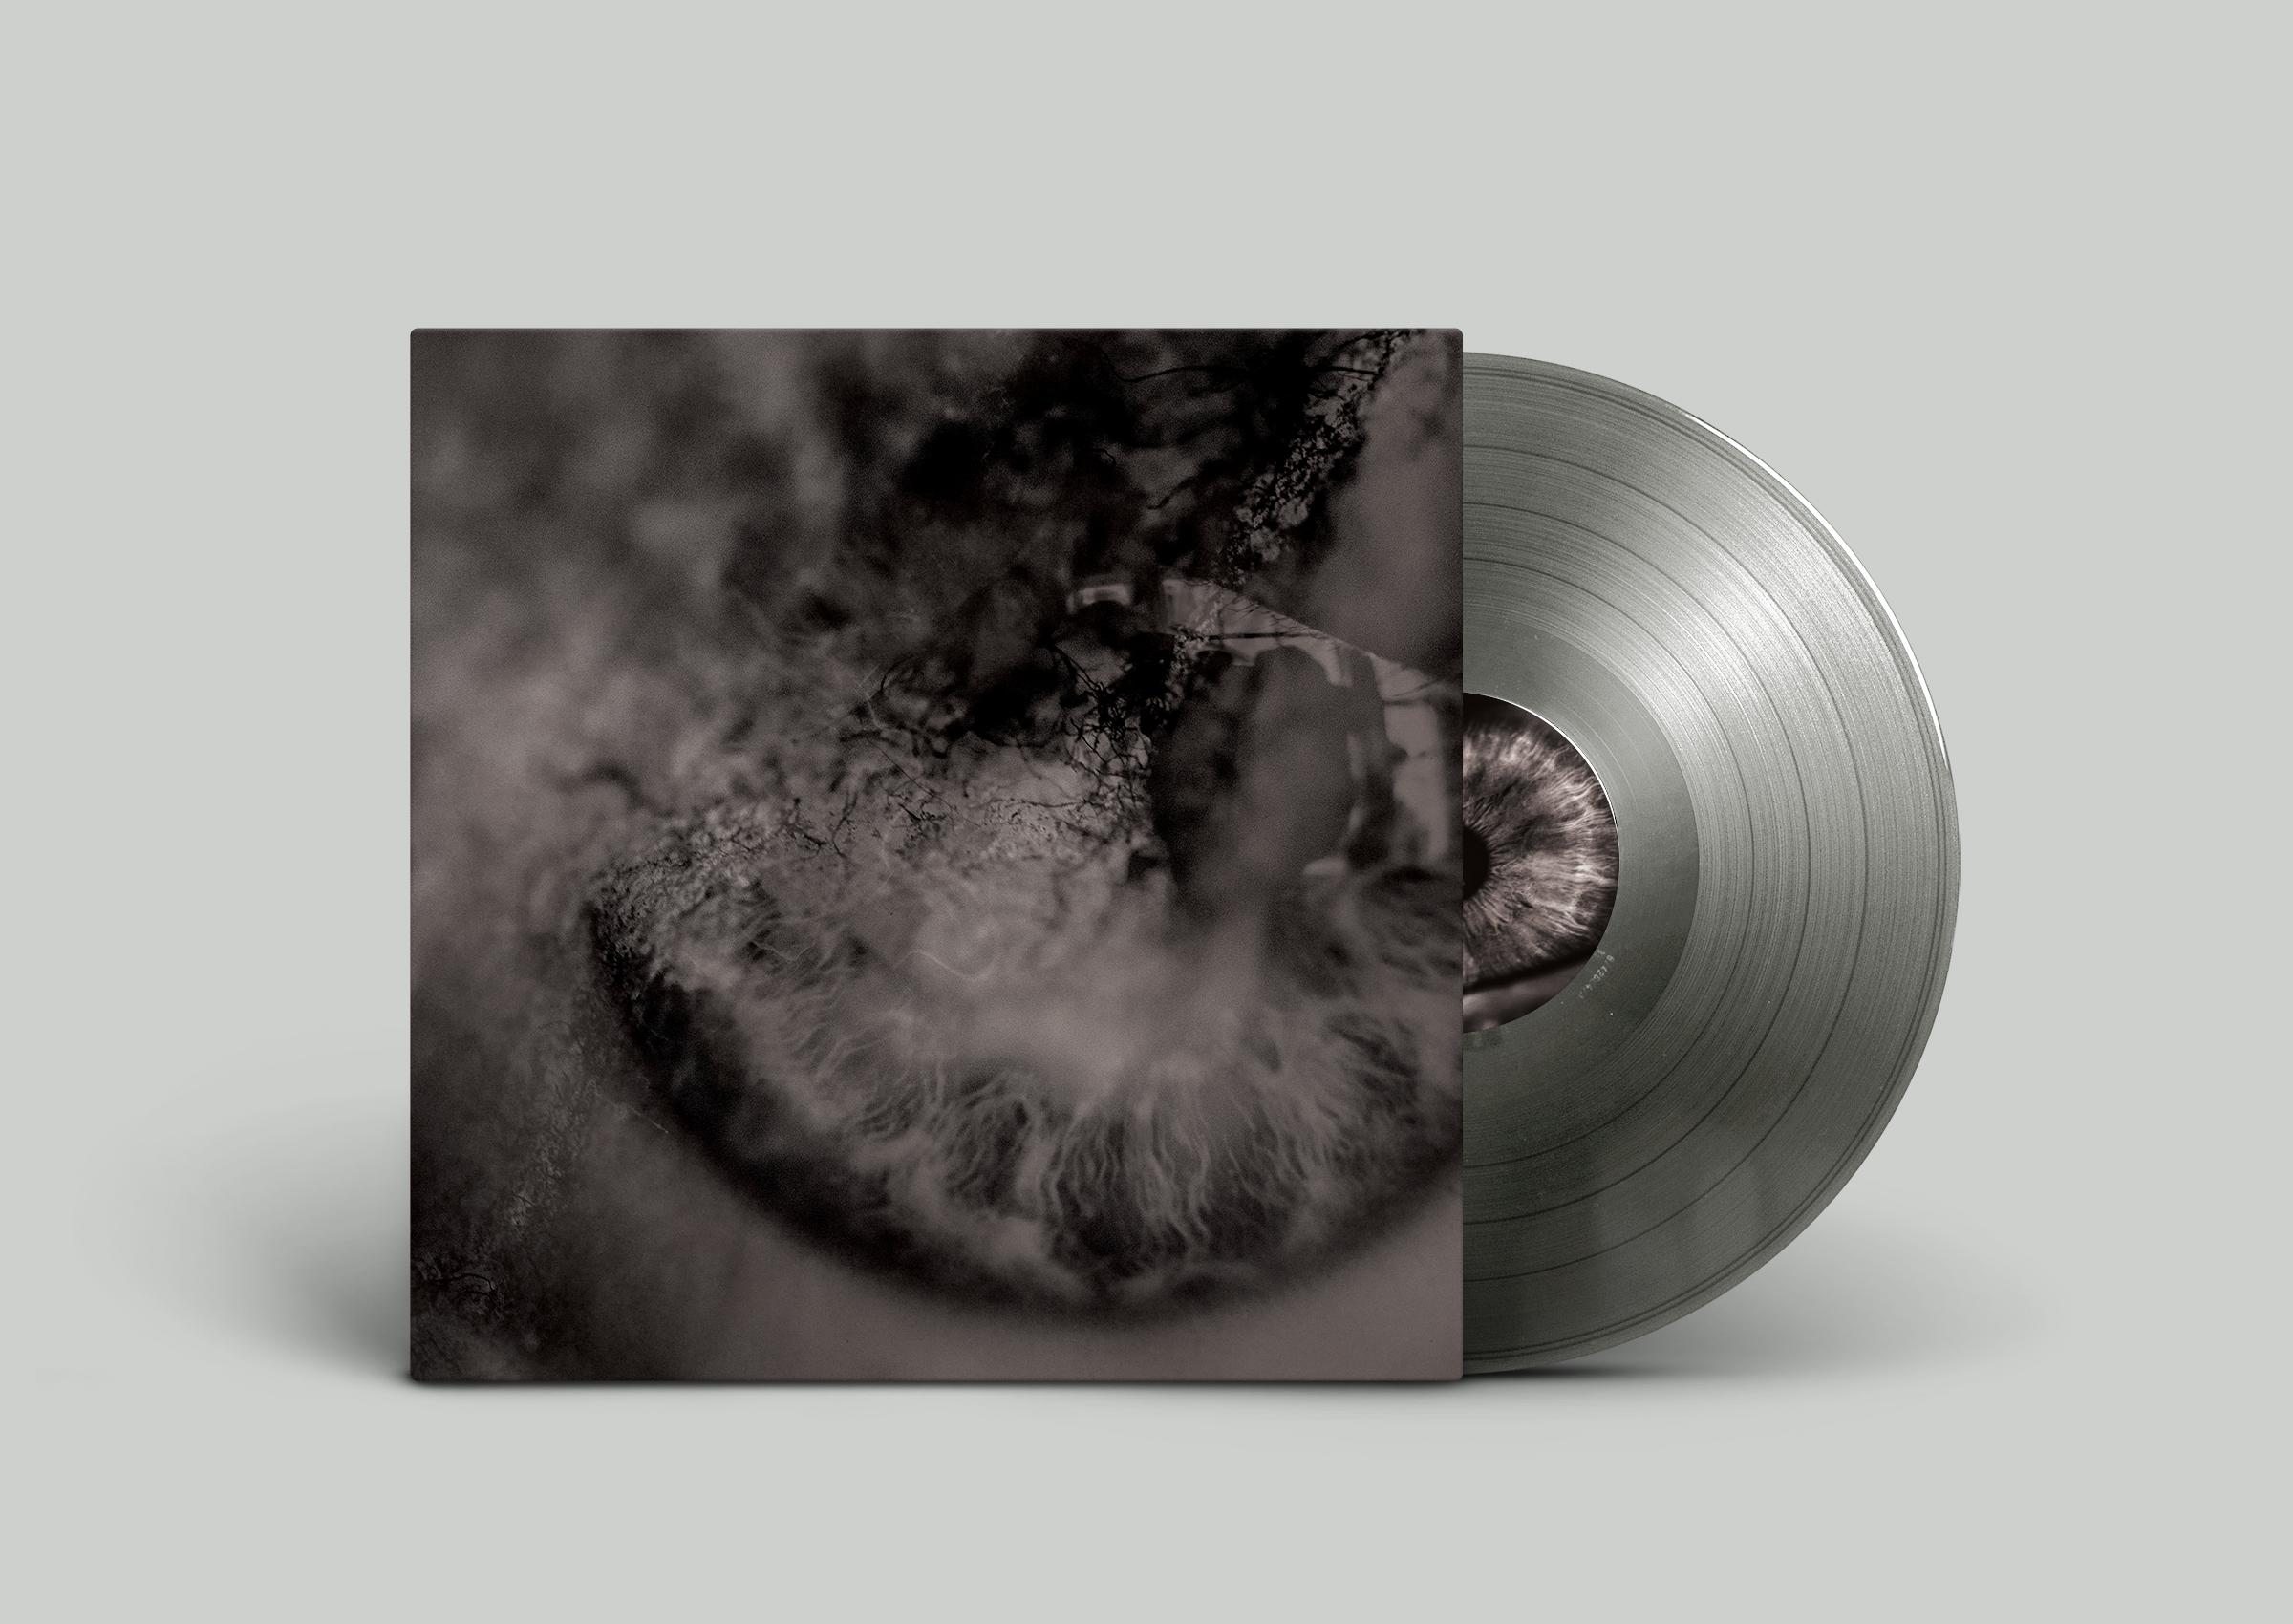 SONANCE / TORPOR - Split 12